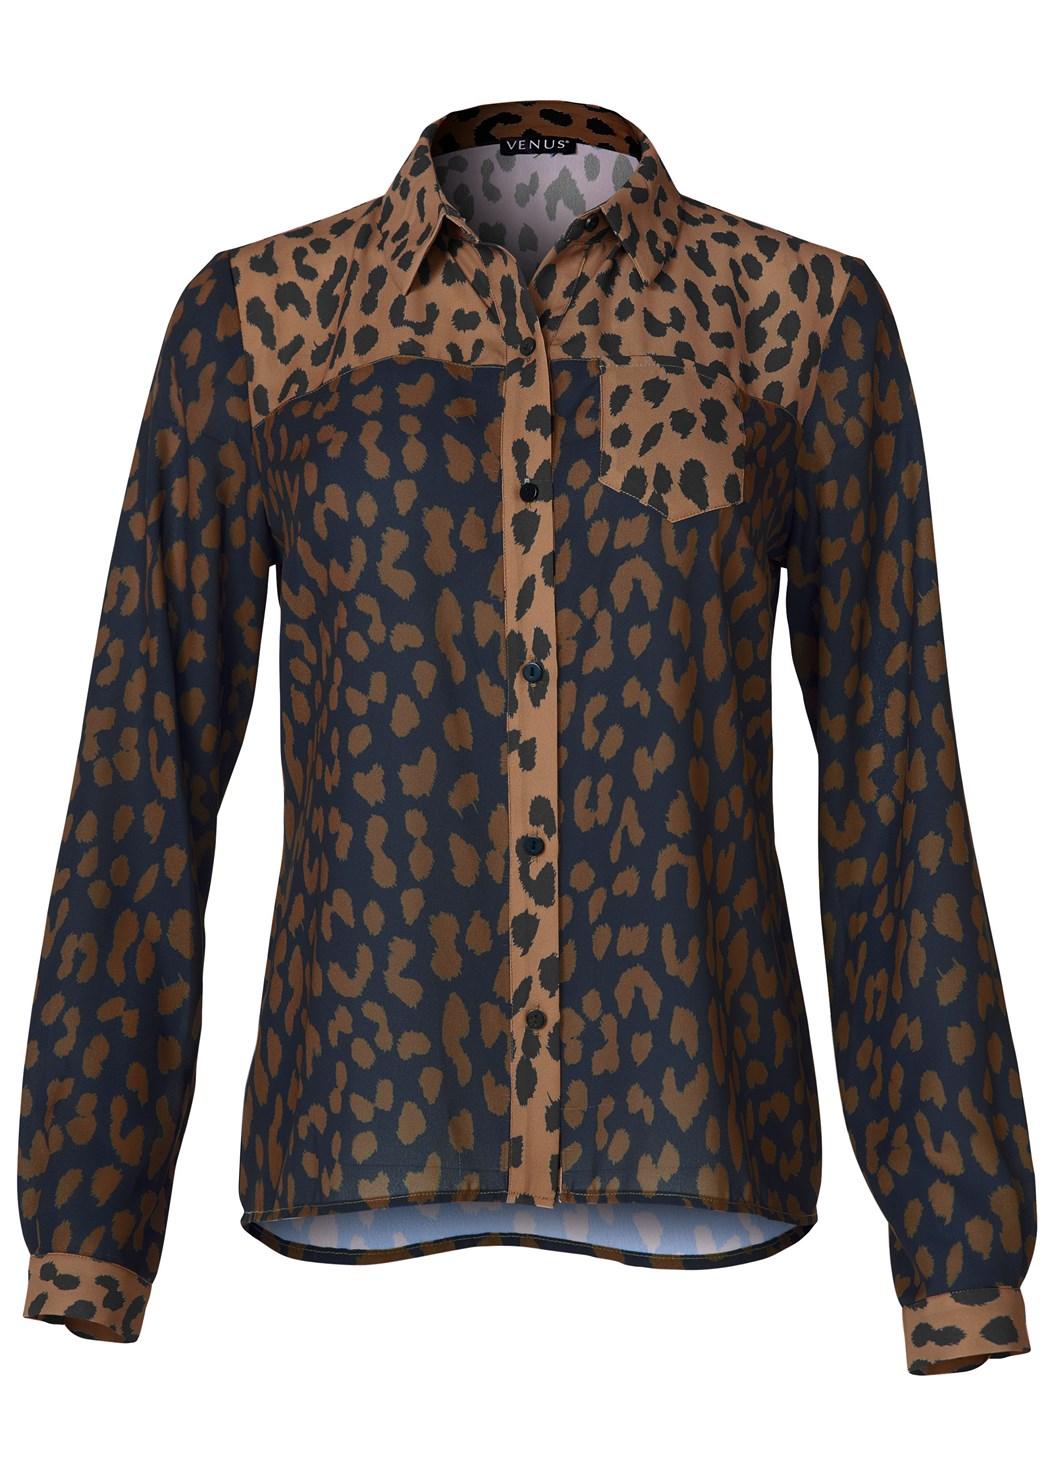 Leopard Blouse,Mid Rise Color Skinny Jeans,Faux Leather Pants,Open Heel Booties,Faux Fur Print Bag